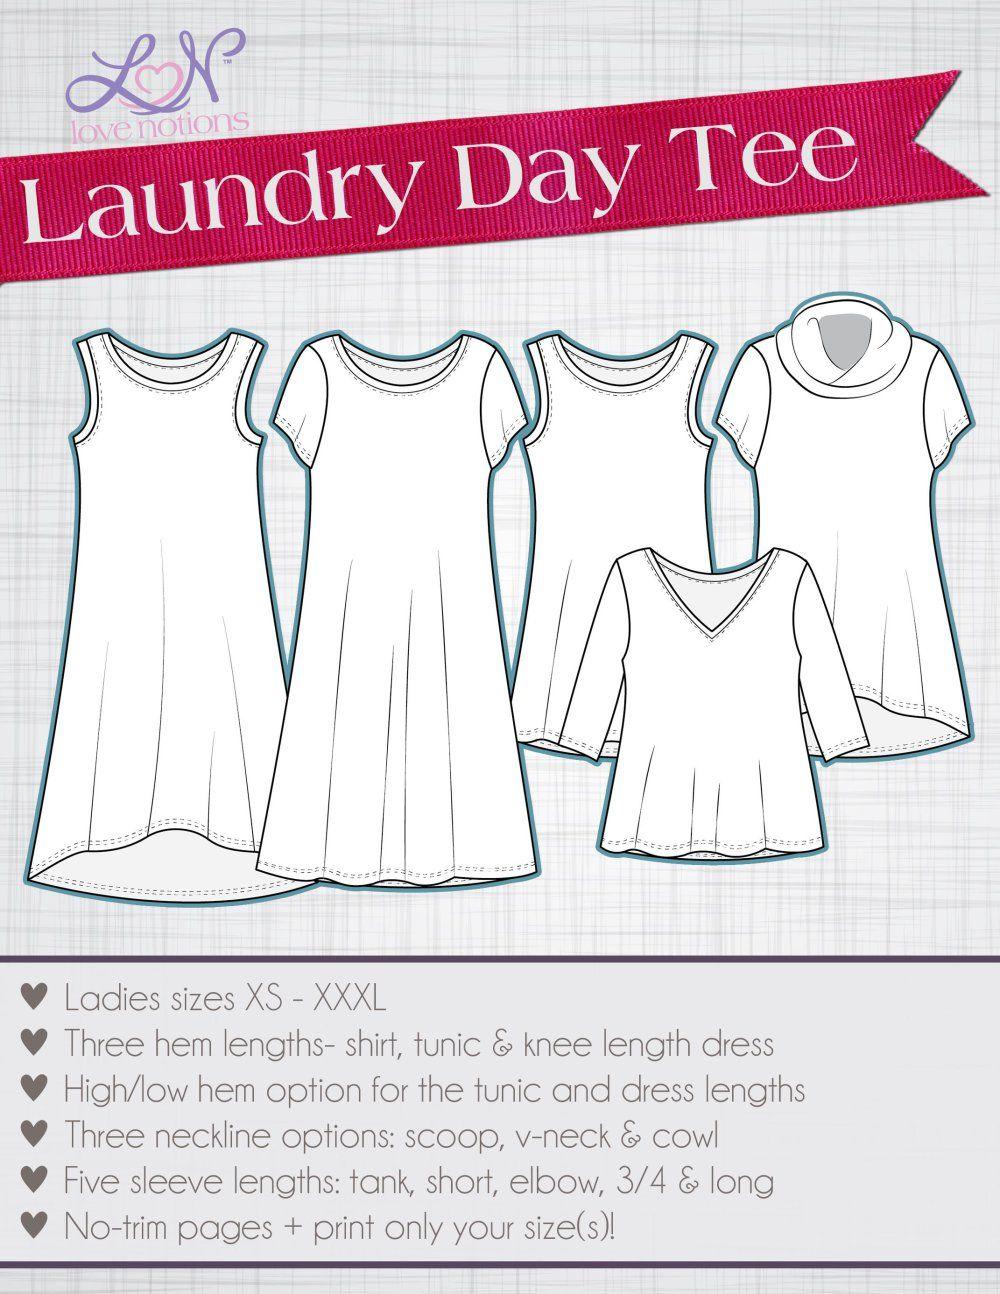 Love Notions Laundry Day Tee XS-XXXL | DIY & crafts | Costura ...